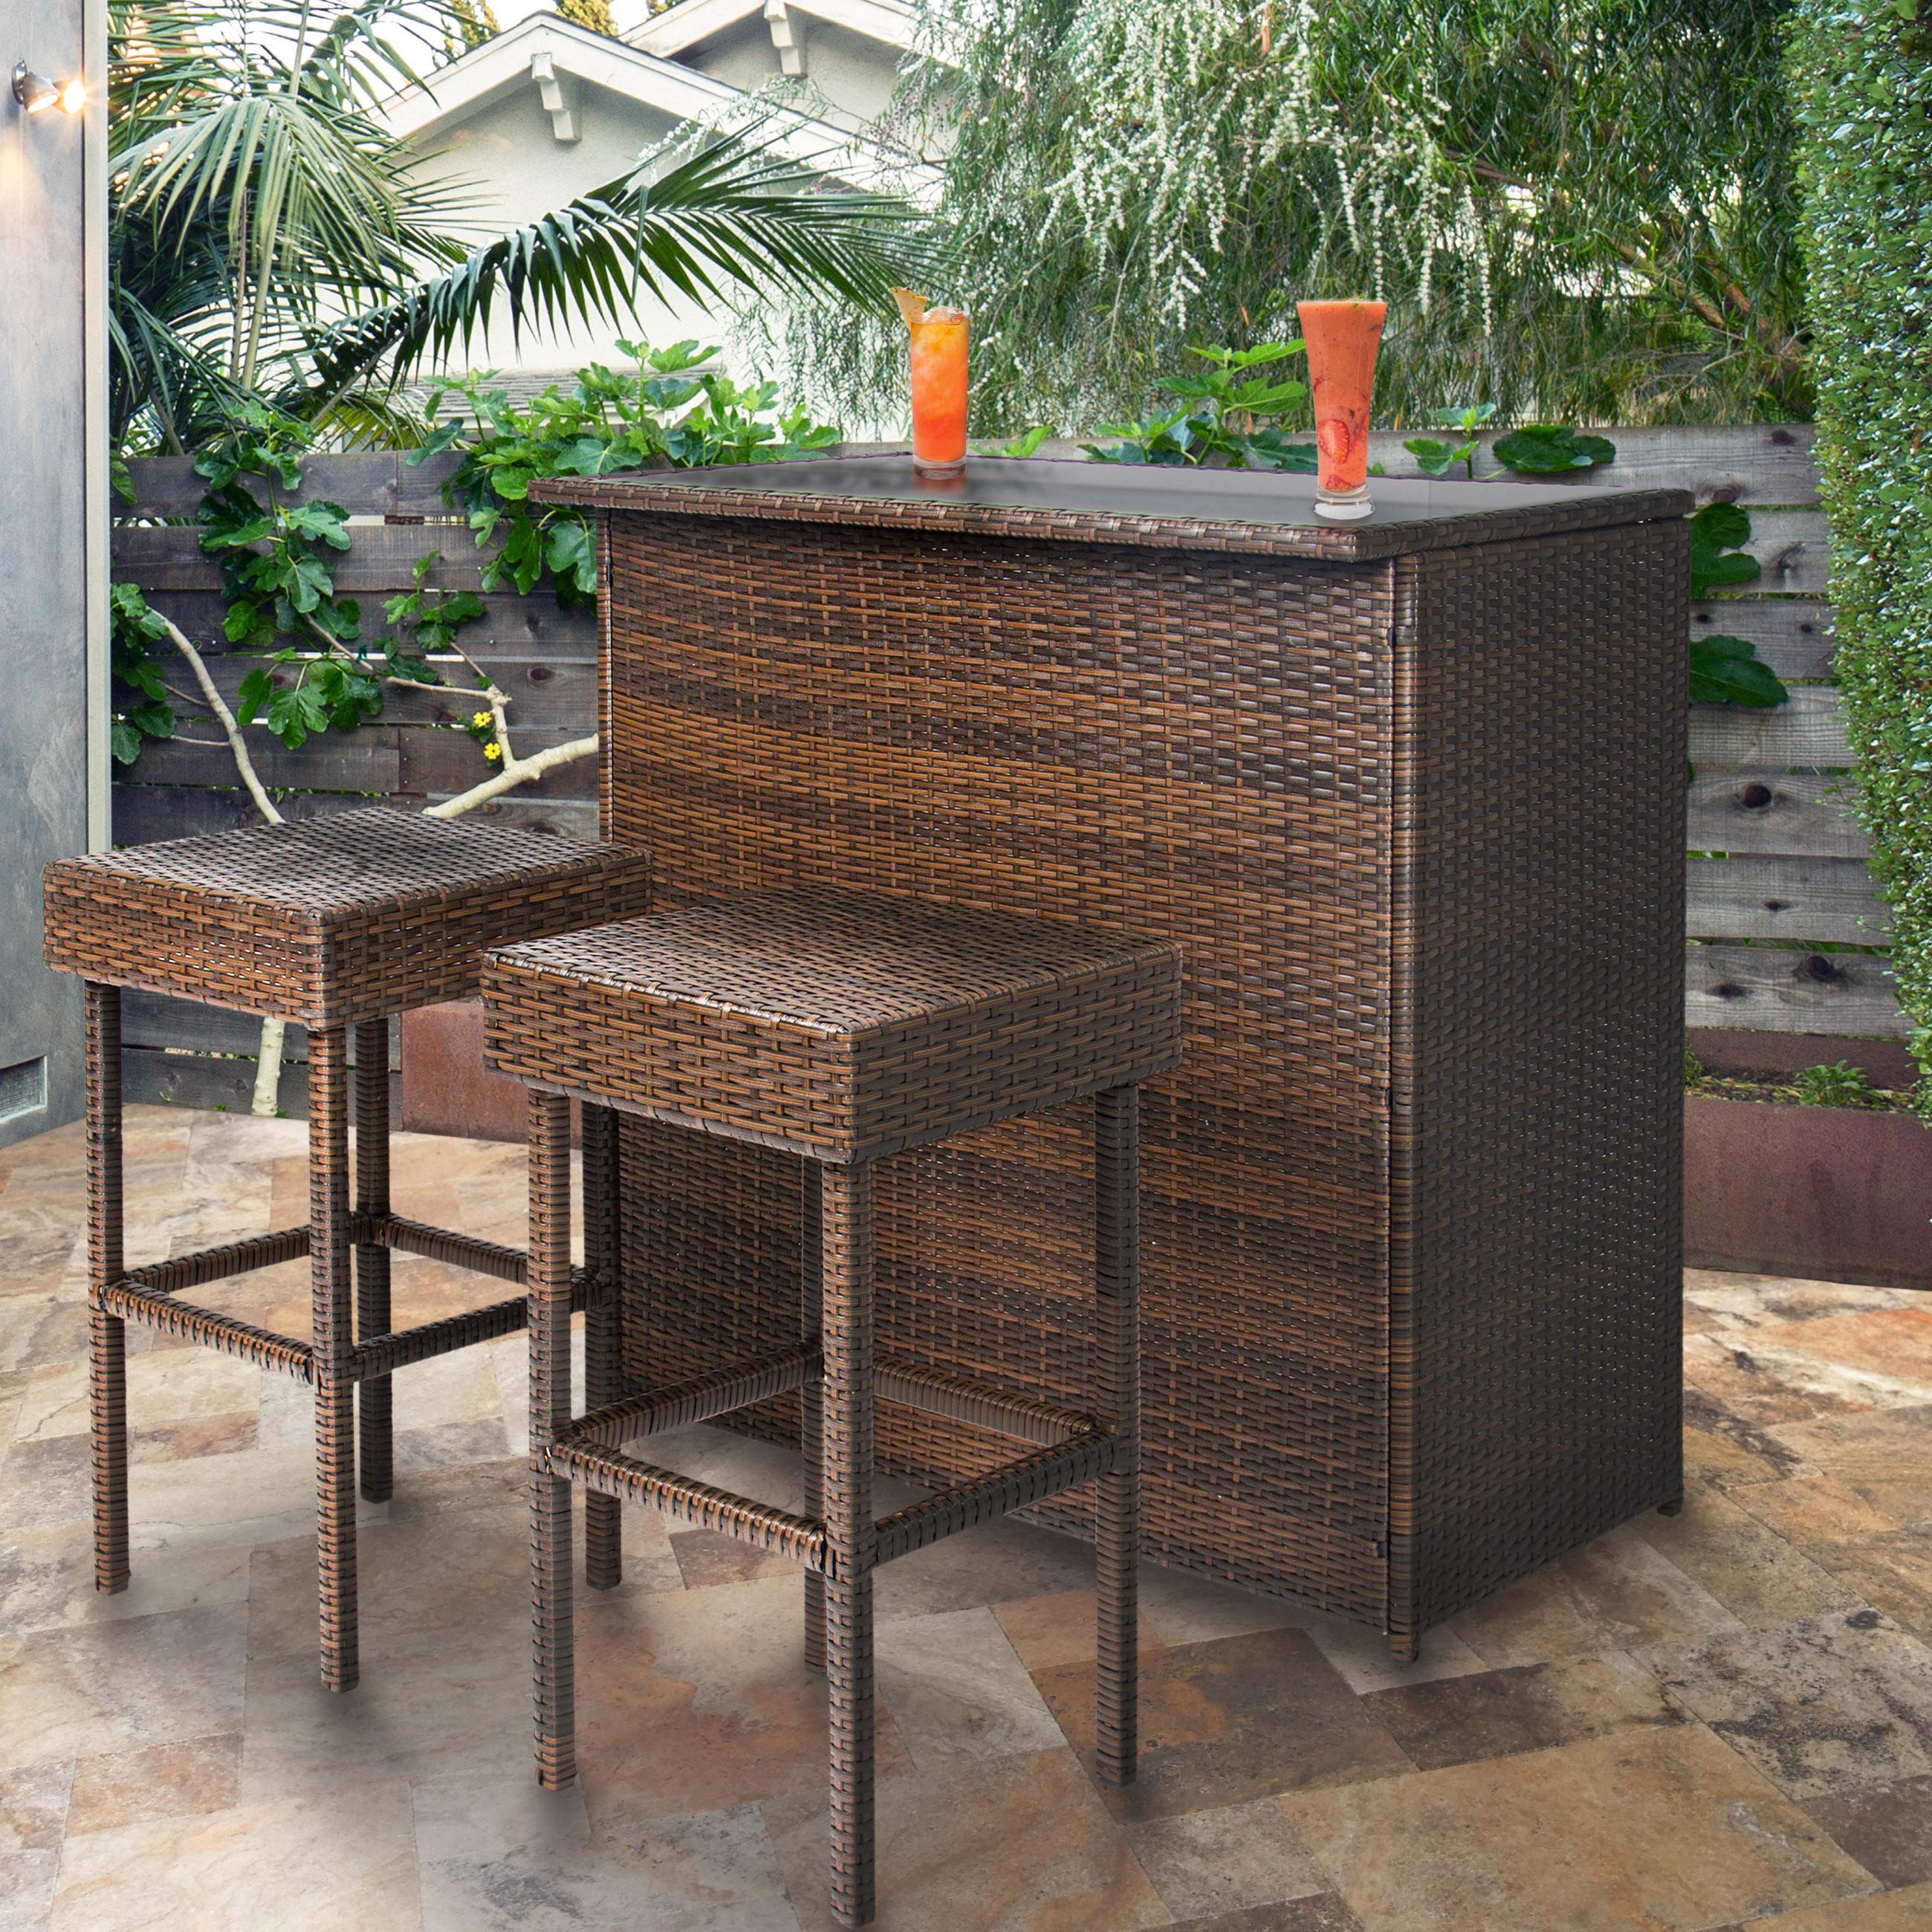 garden set. Best Choice Products 3PC Wicker Bar Set Patio Outdoor Backyard Table \u0026 2 Stools Rattan Garden